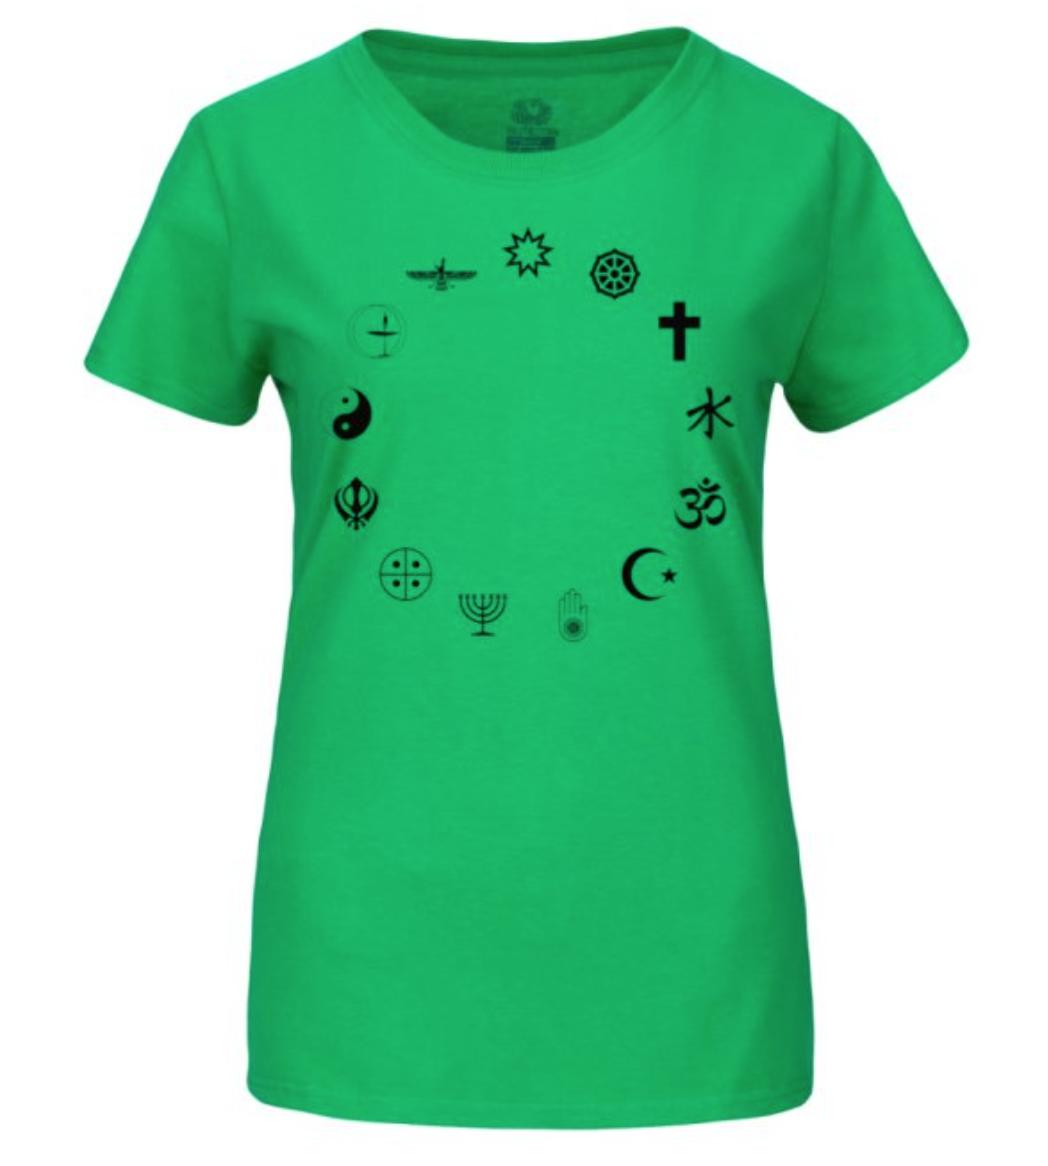 Harmony Women's Basic T-Shirt Medium 00003